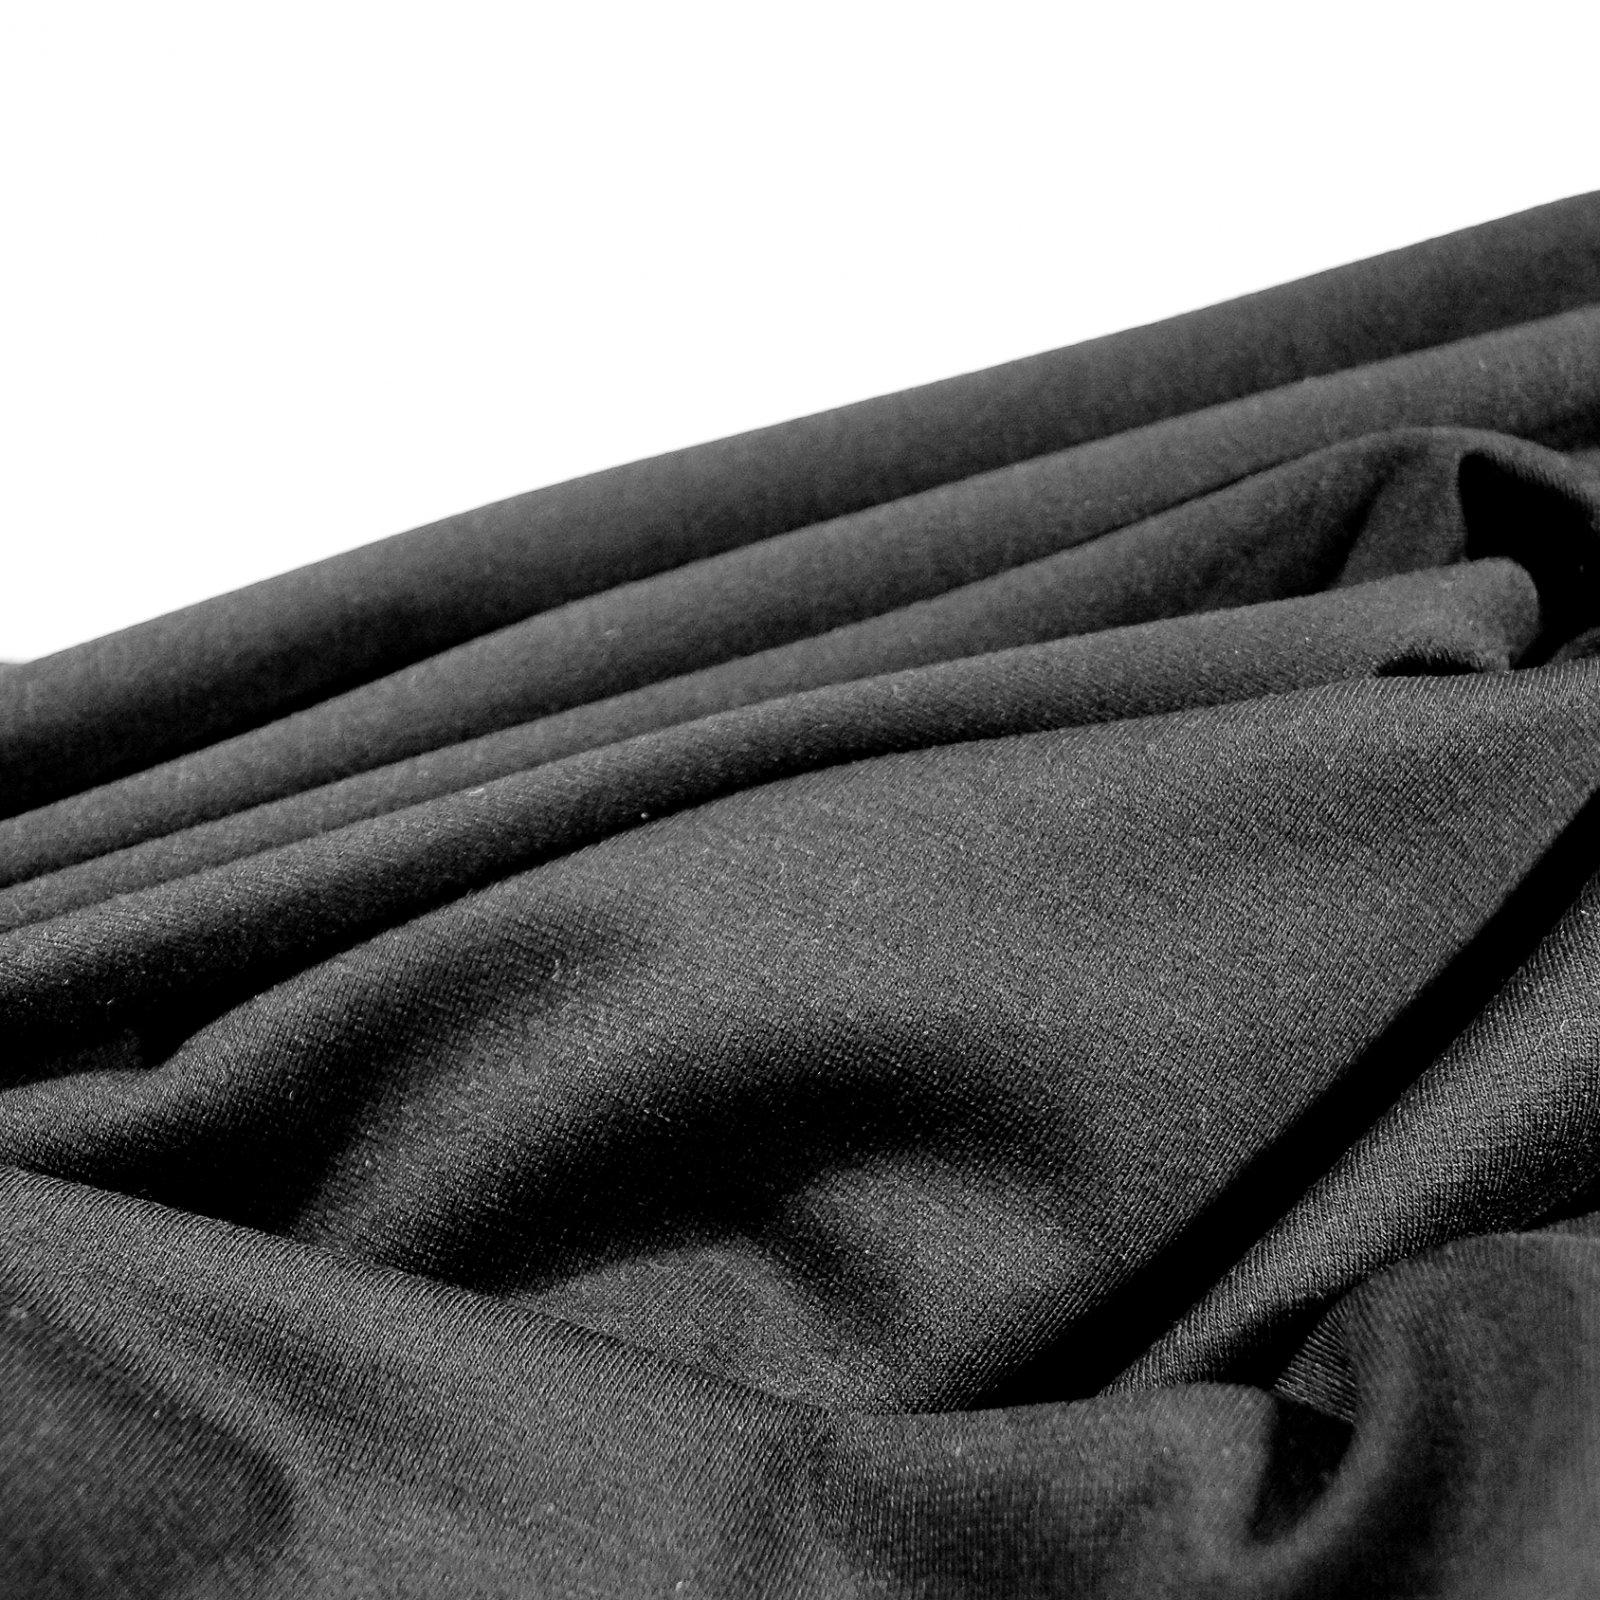 Knit - Black Ponte Knit